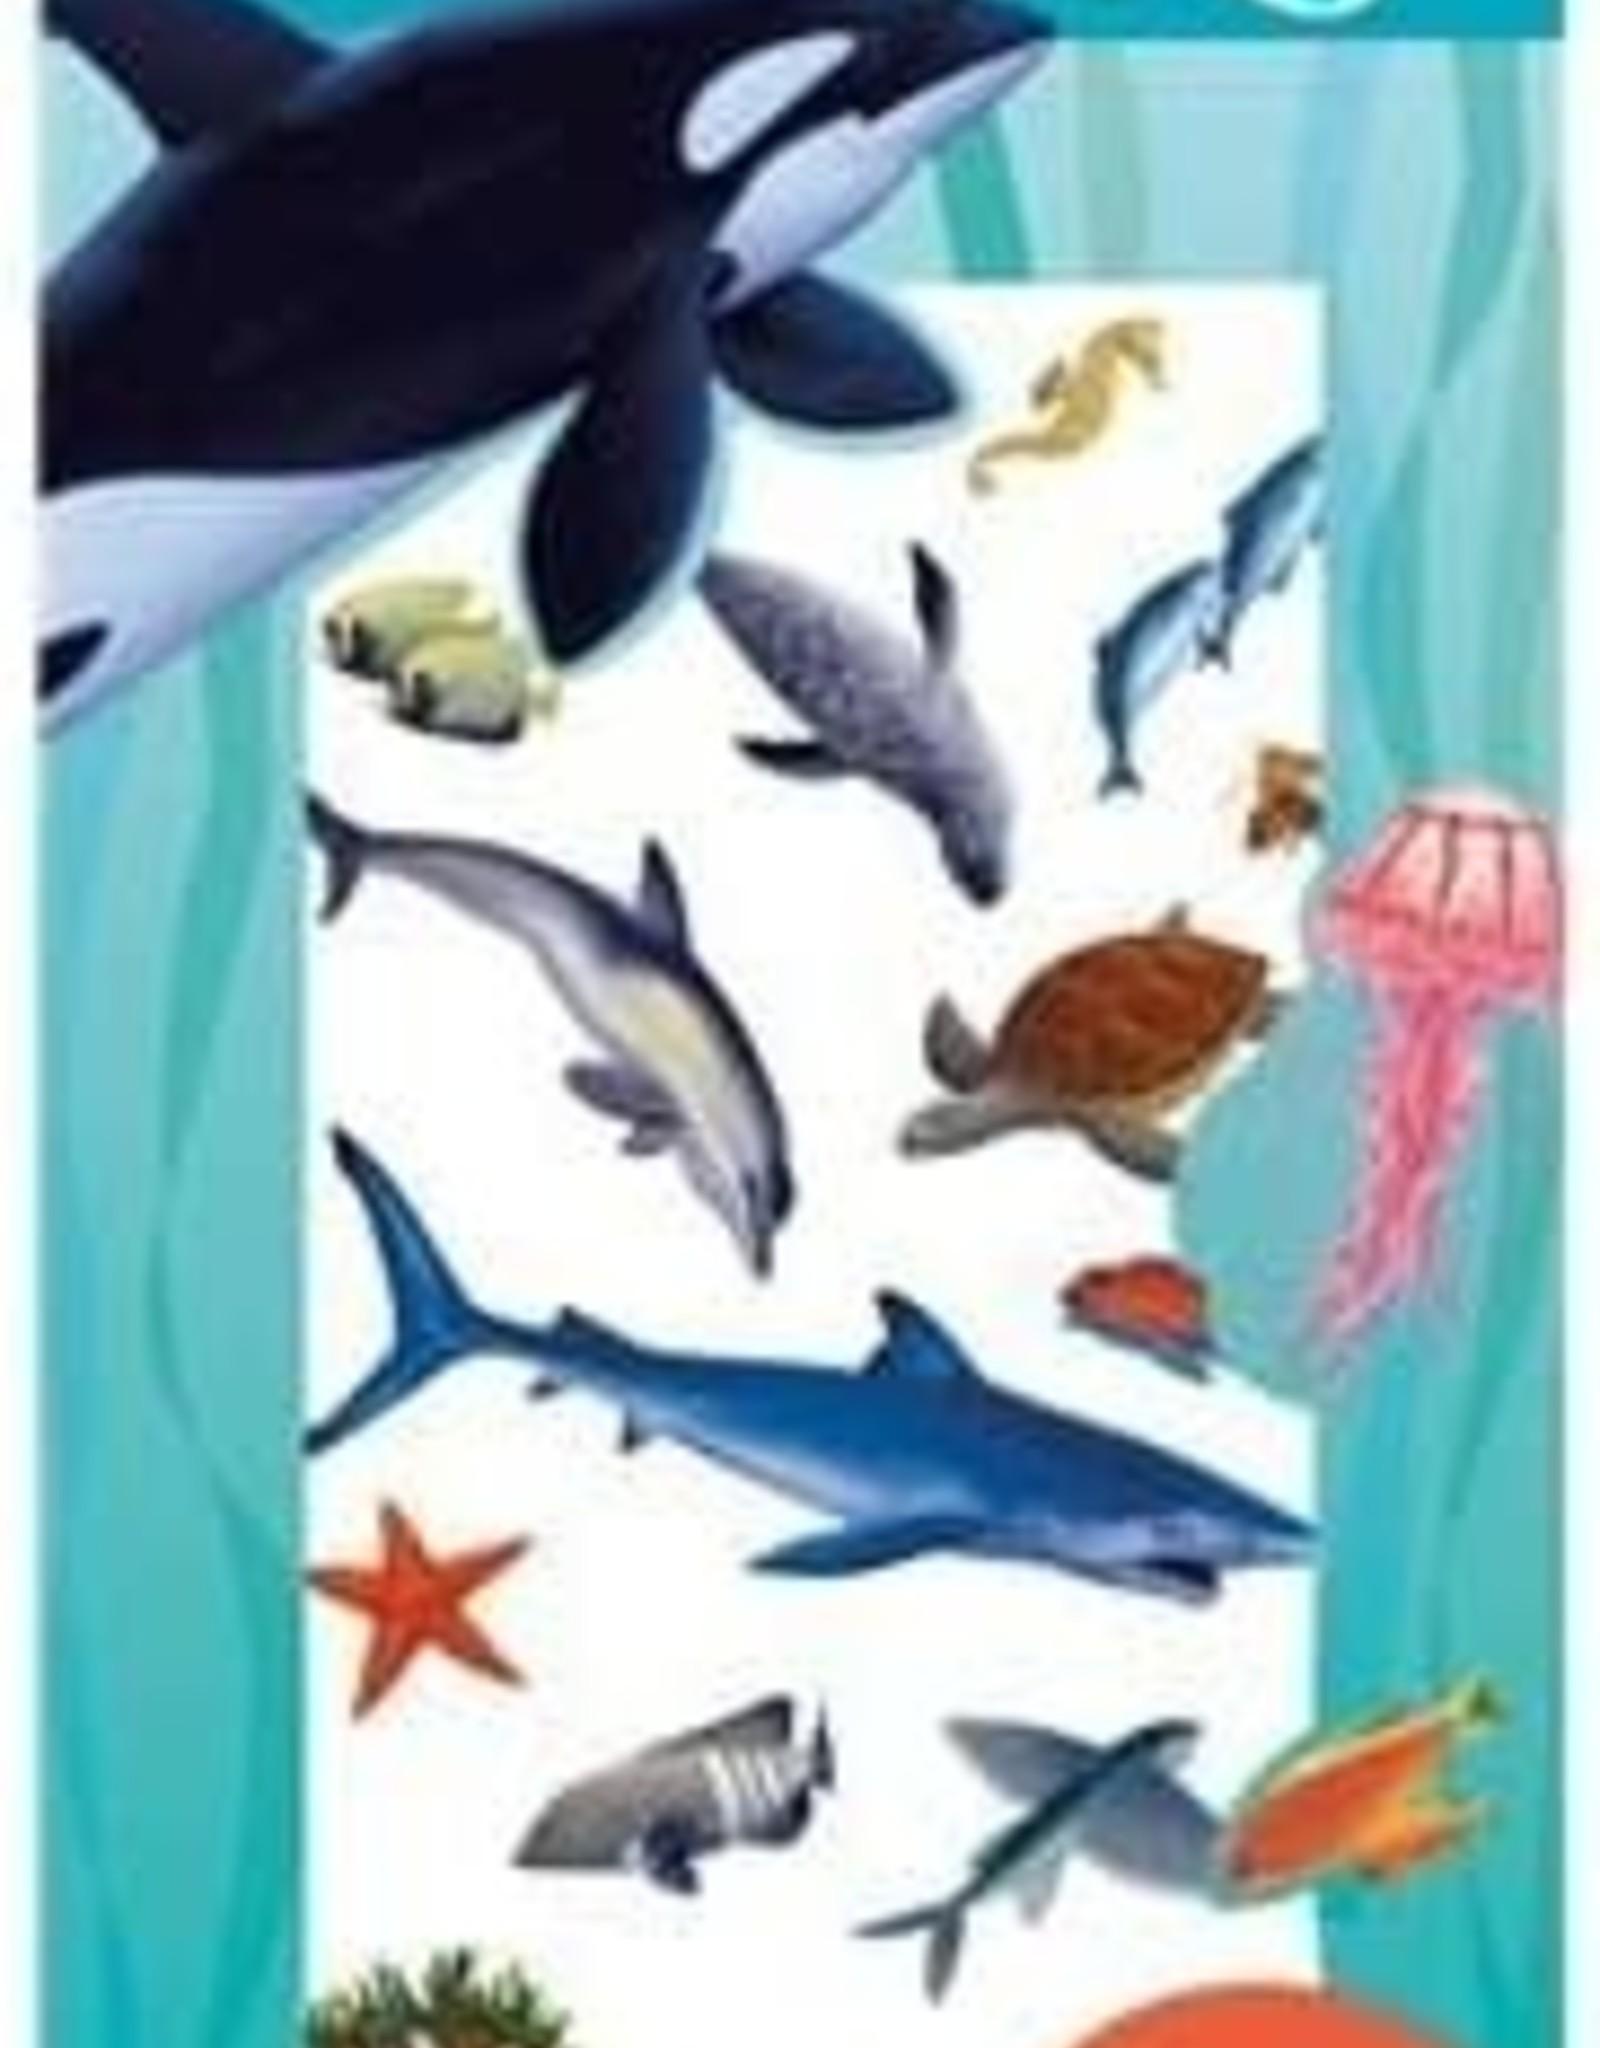 Peaceable Kingdom Sea Life Stickers